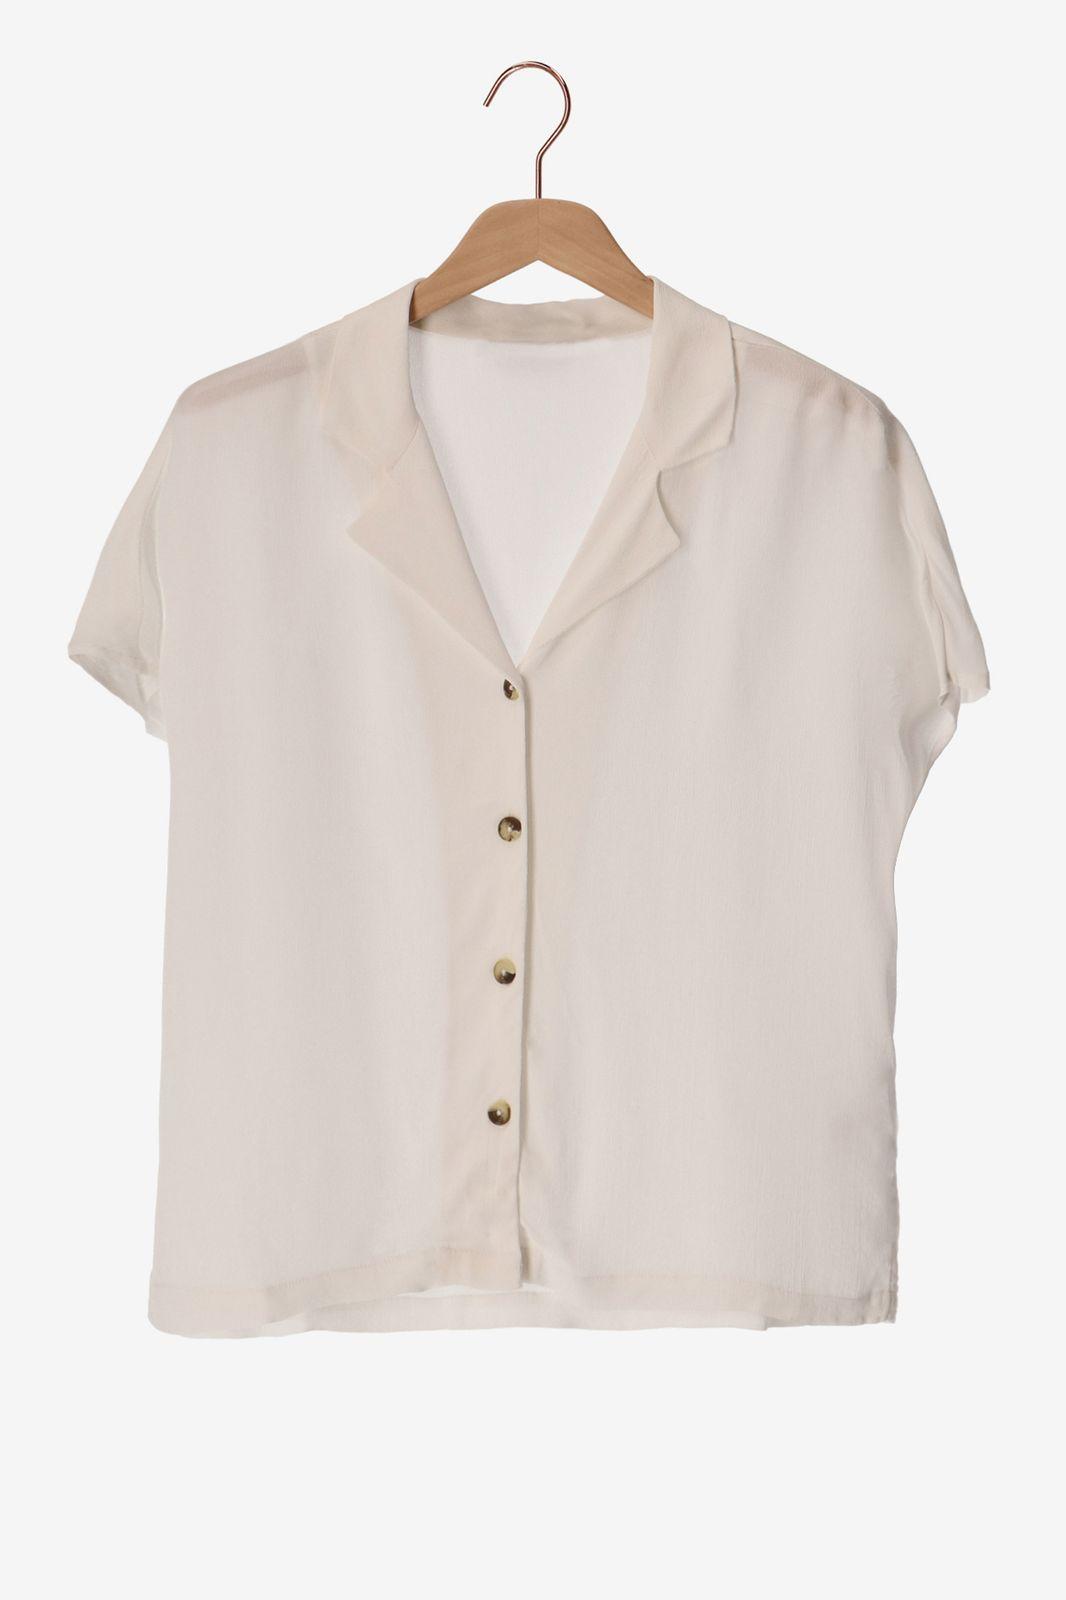 Witte blouse met korte mouwen